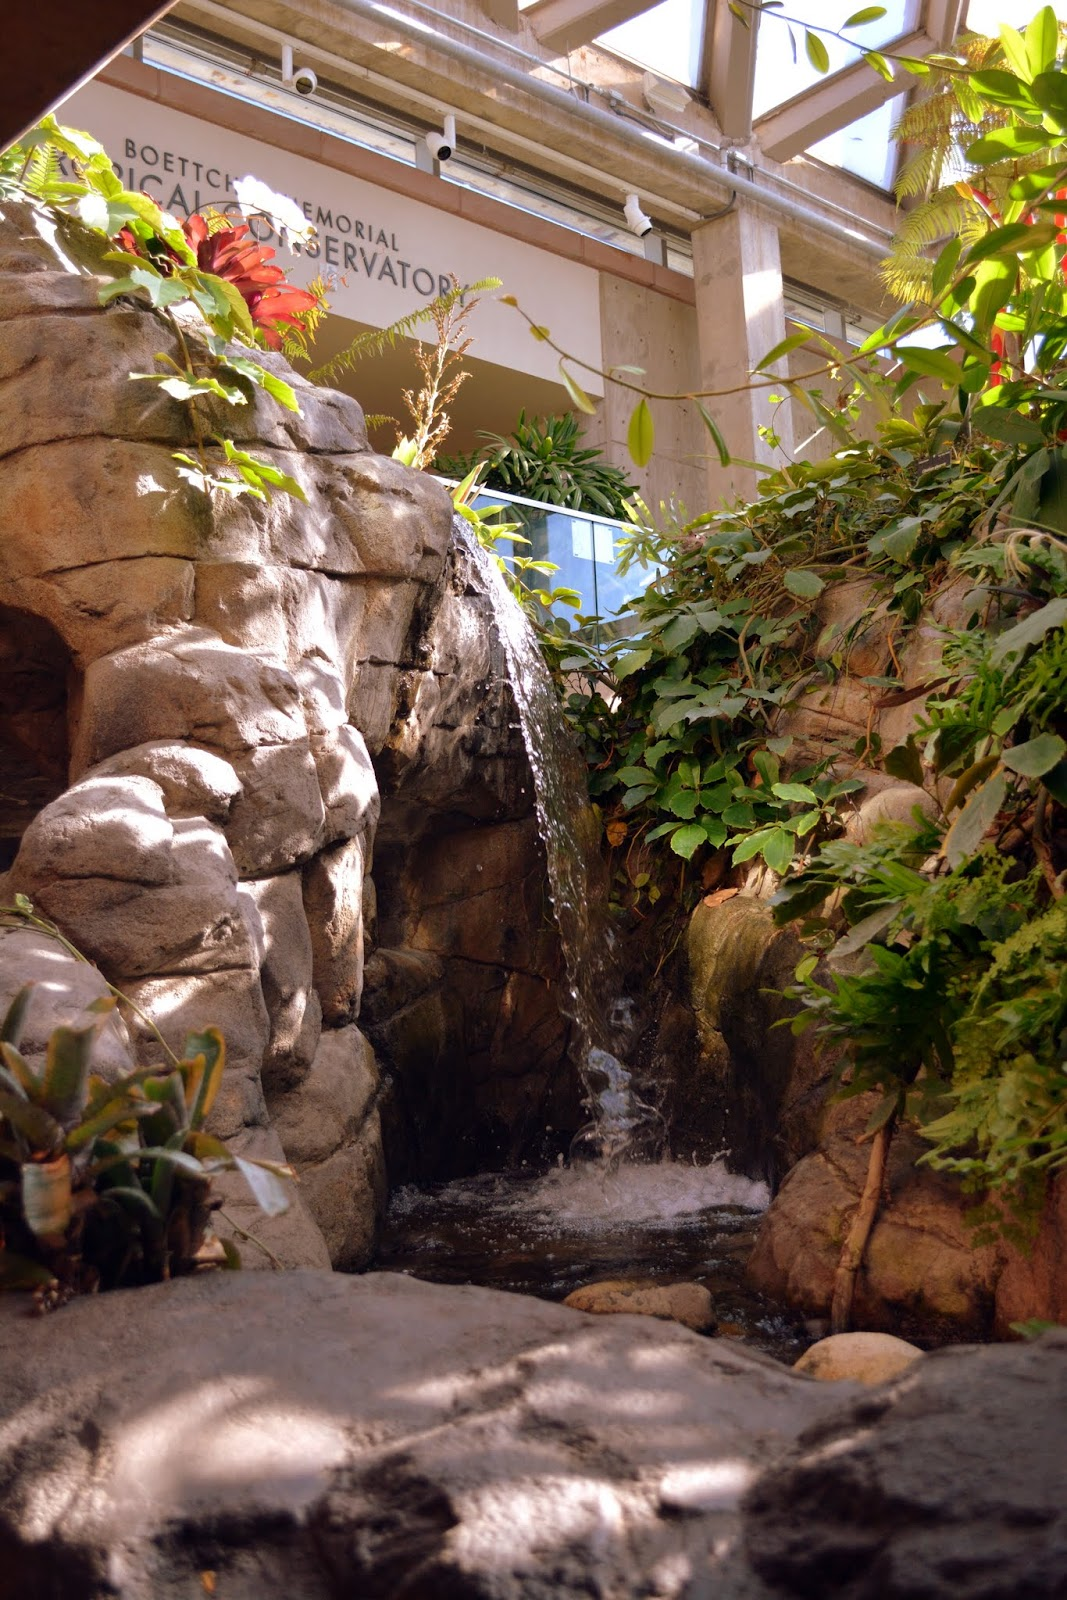 Mille Fiori Favoriti: The Denver Botanic Garden in Autumn